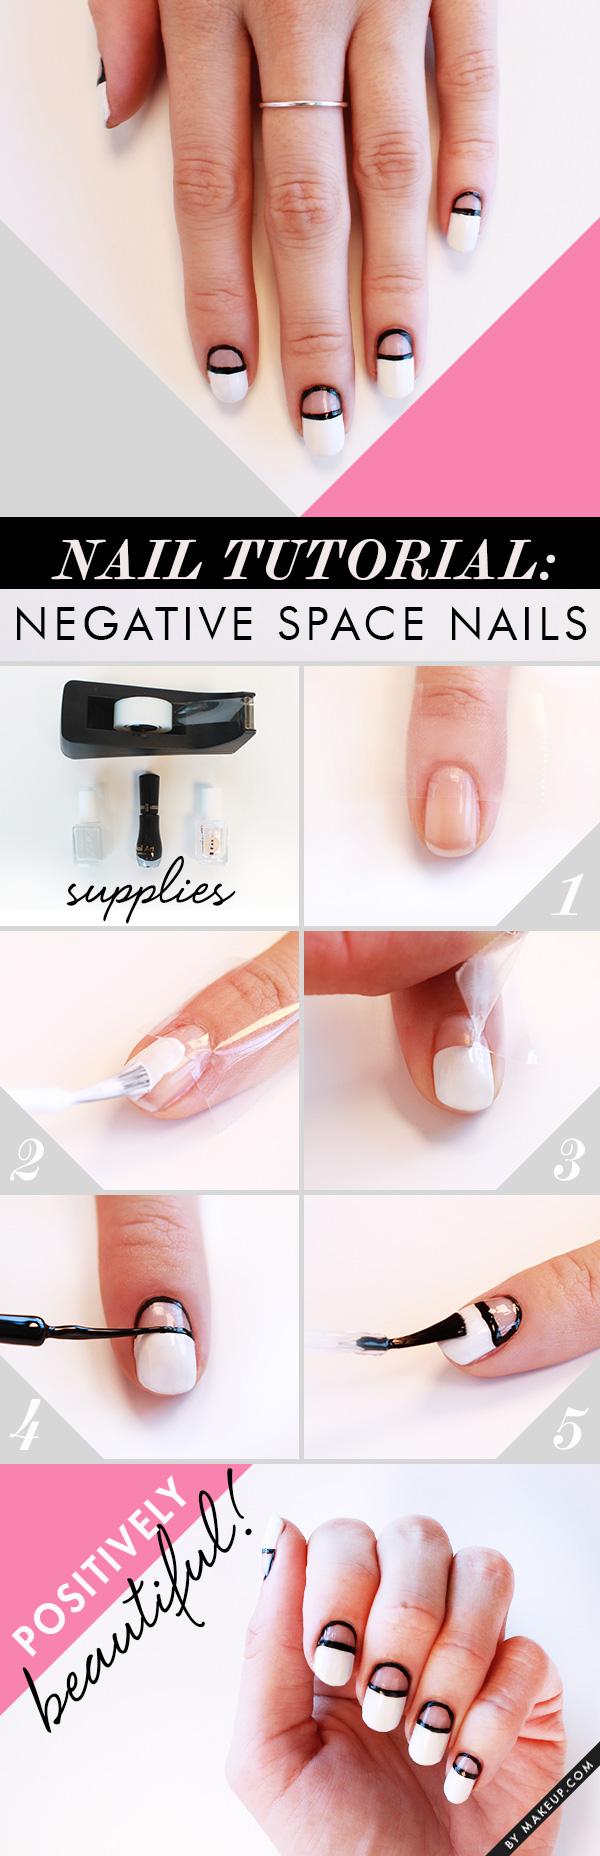 negative-space-nails3_